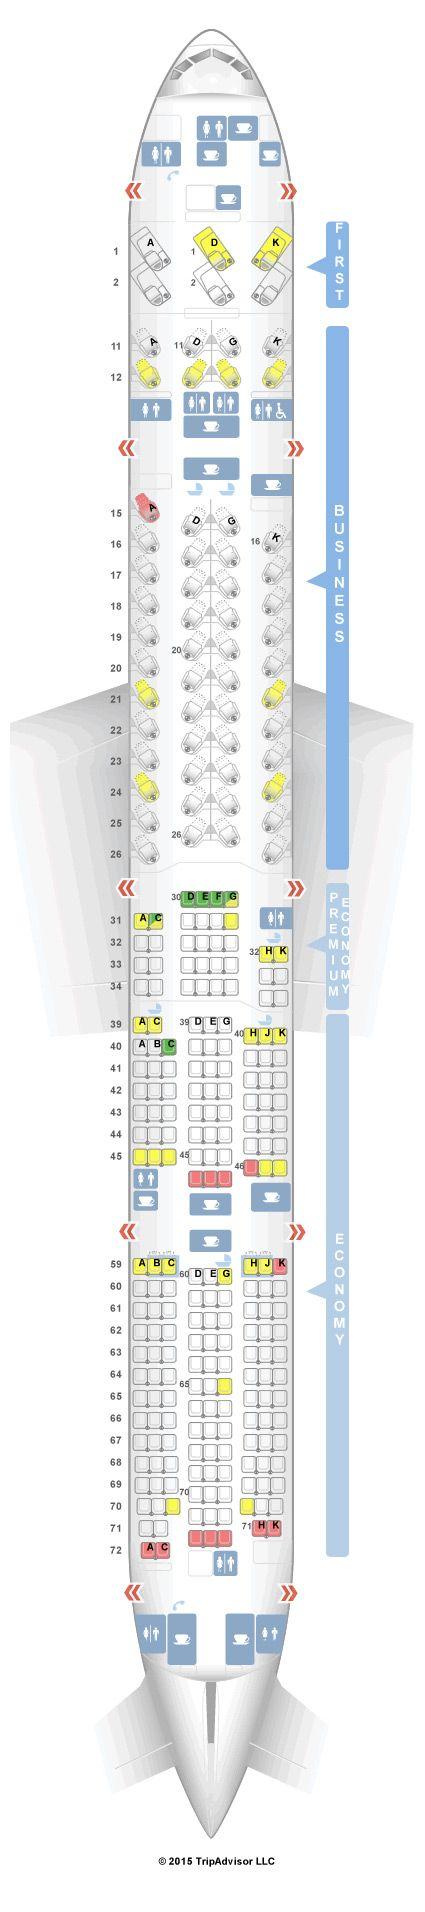 medium resolution of seatguru seat map cathay pacific boeing 777 300er 77h four class